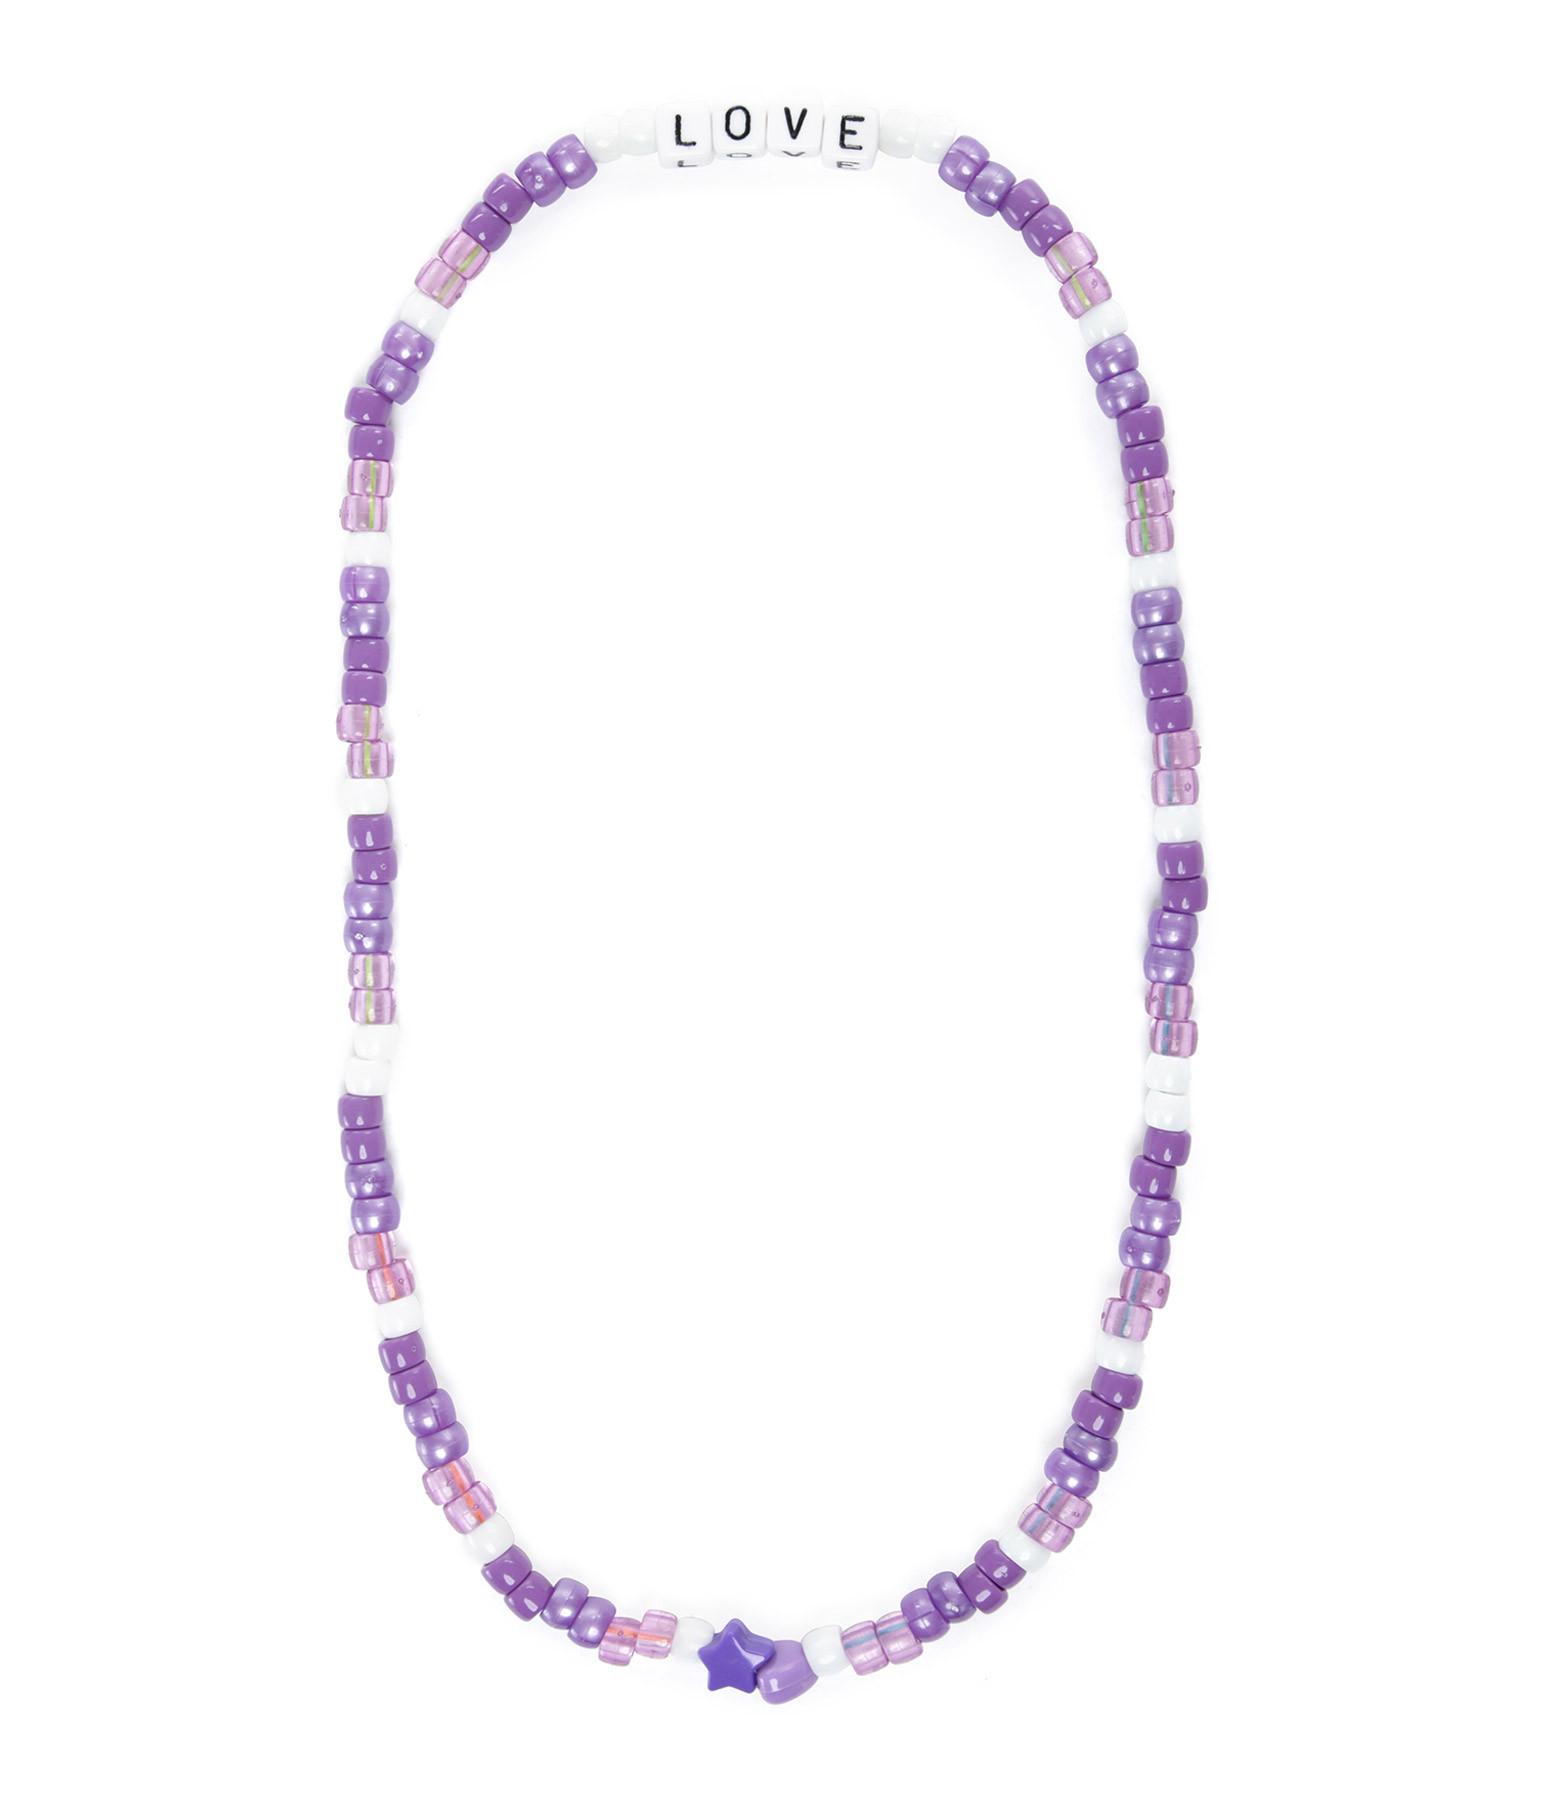 LAUREN RUBINSKI - Collier Love Beads LOVE